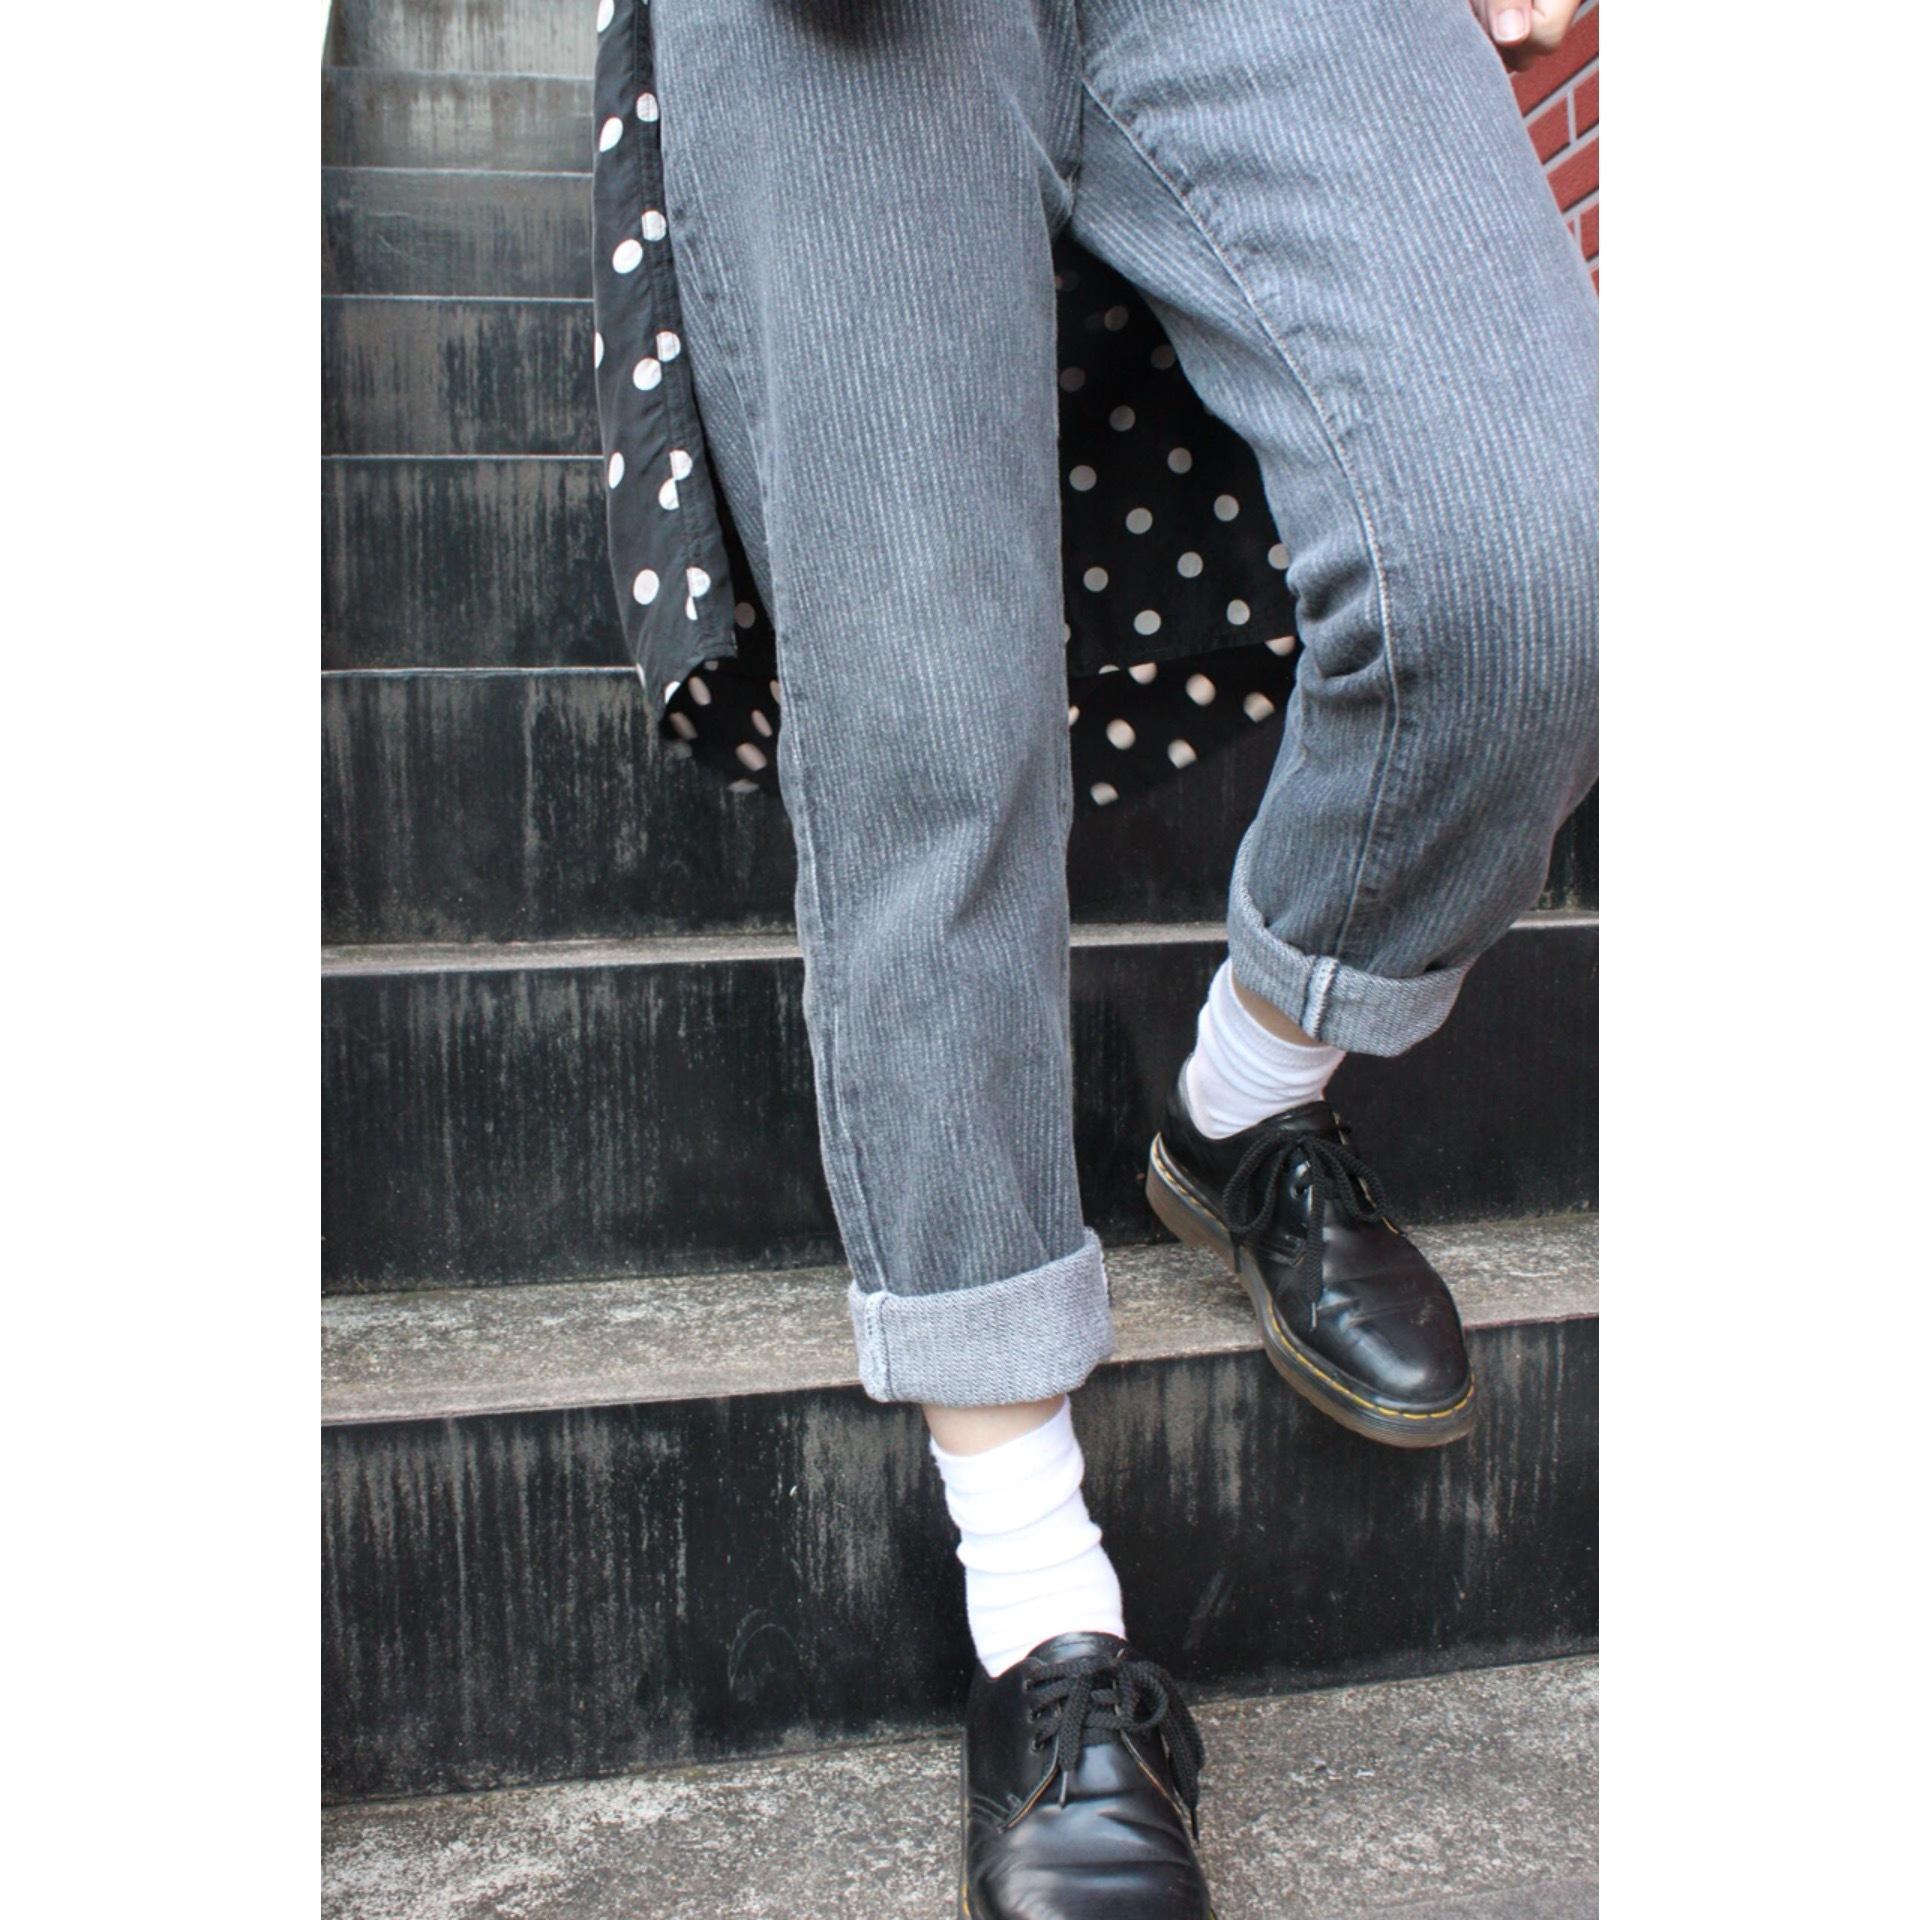 Vintage stripe denim pants by Levis